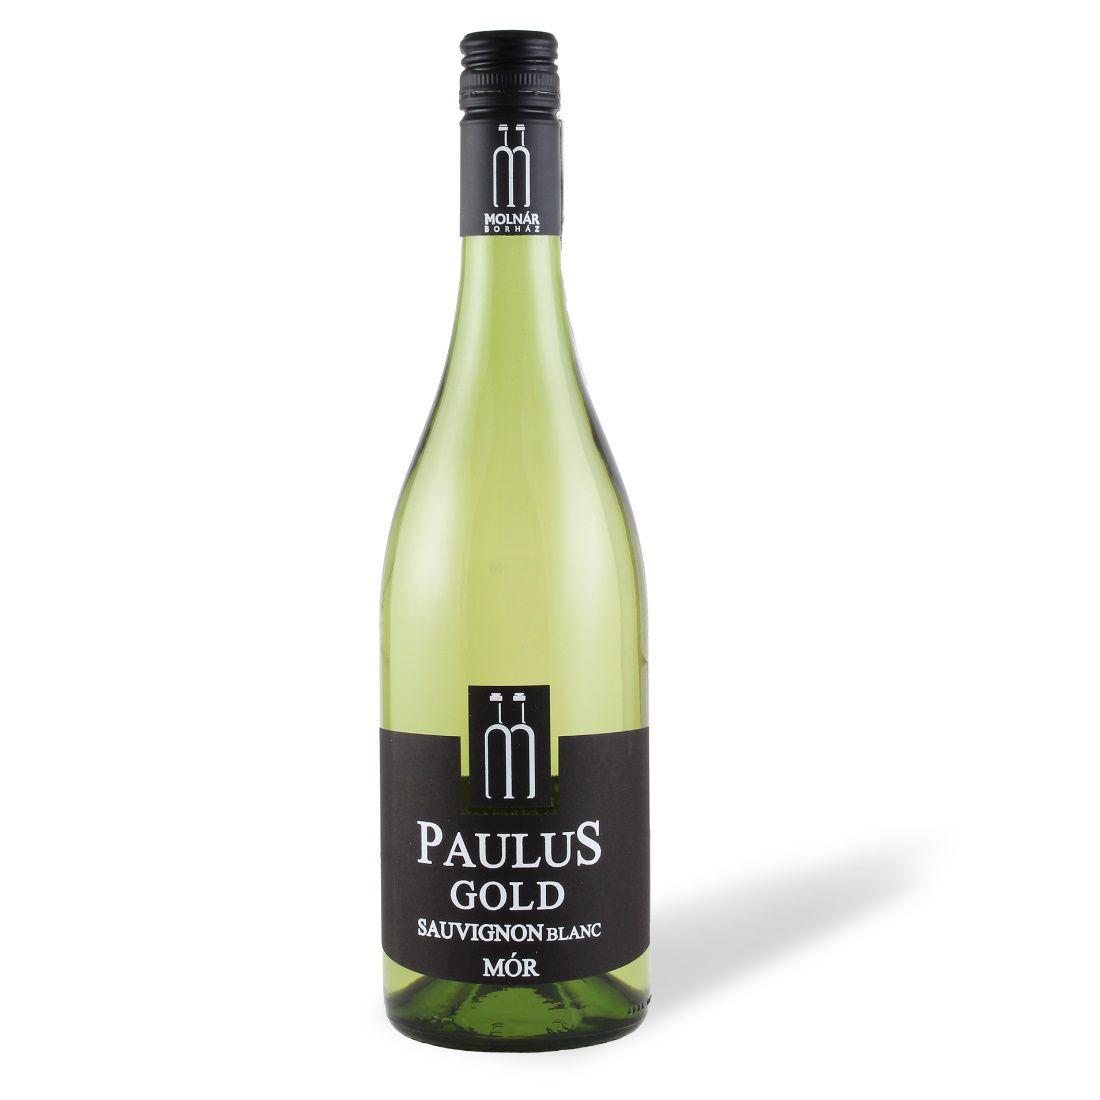 Paulus Gold Sauvignon Blanc 2020 0,75l